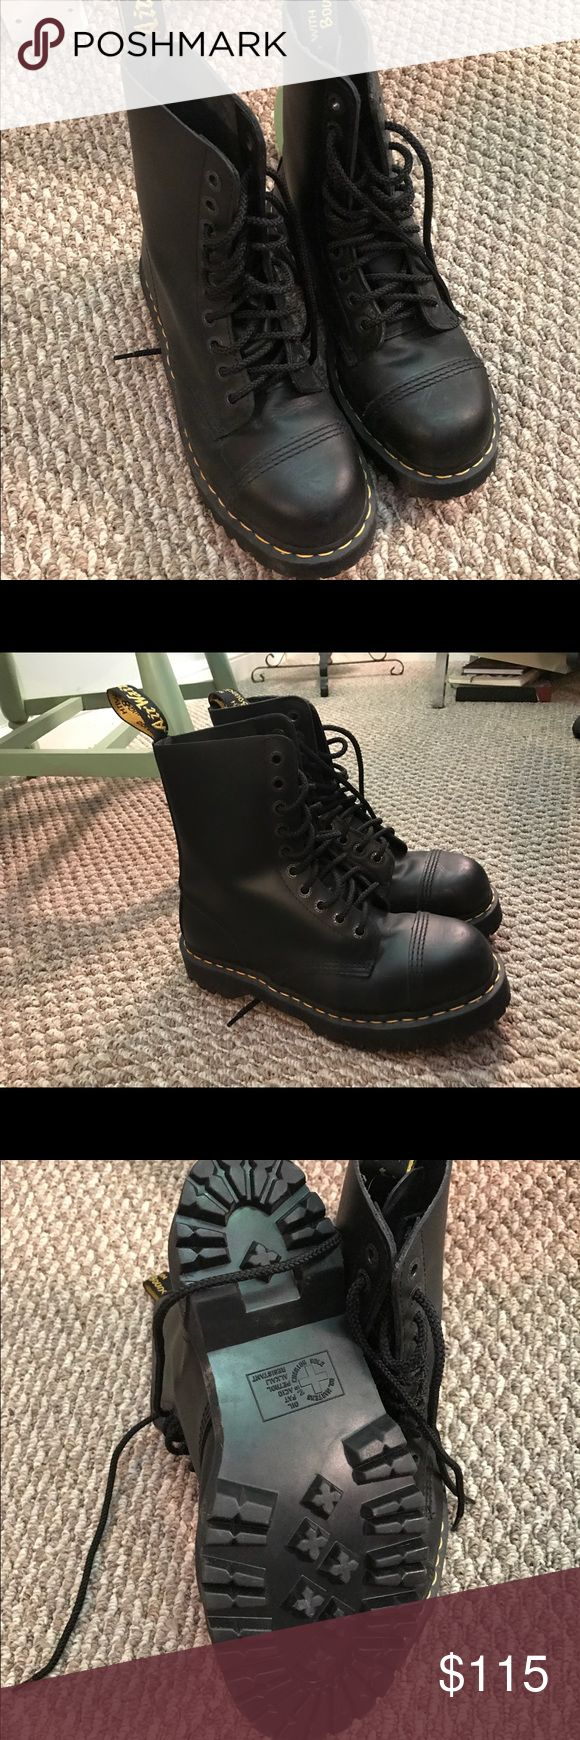 Dr. Marten Steel Toe Boots Brand new Dr. Marten steel toe boots! No tags, but never warn Dr. Martens Shoes Combat & Moto Boots